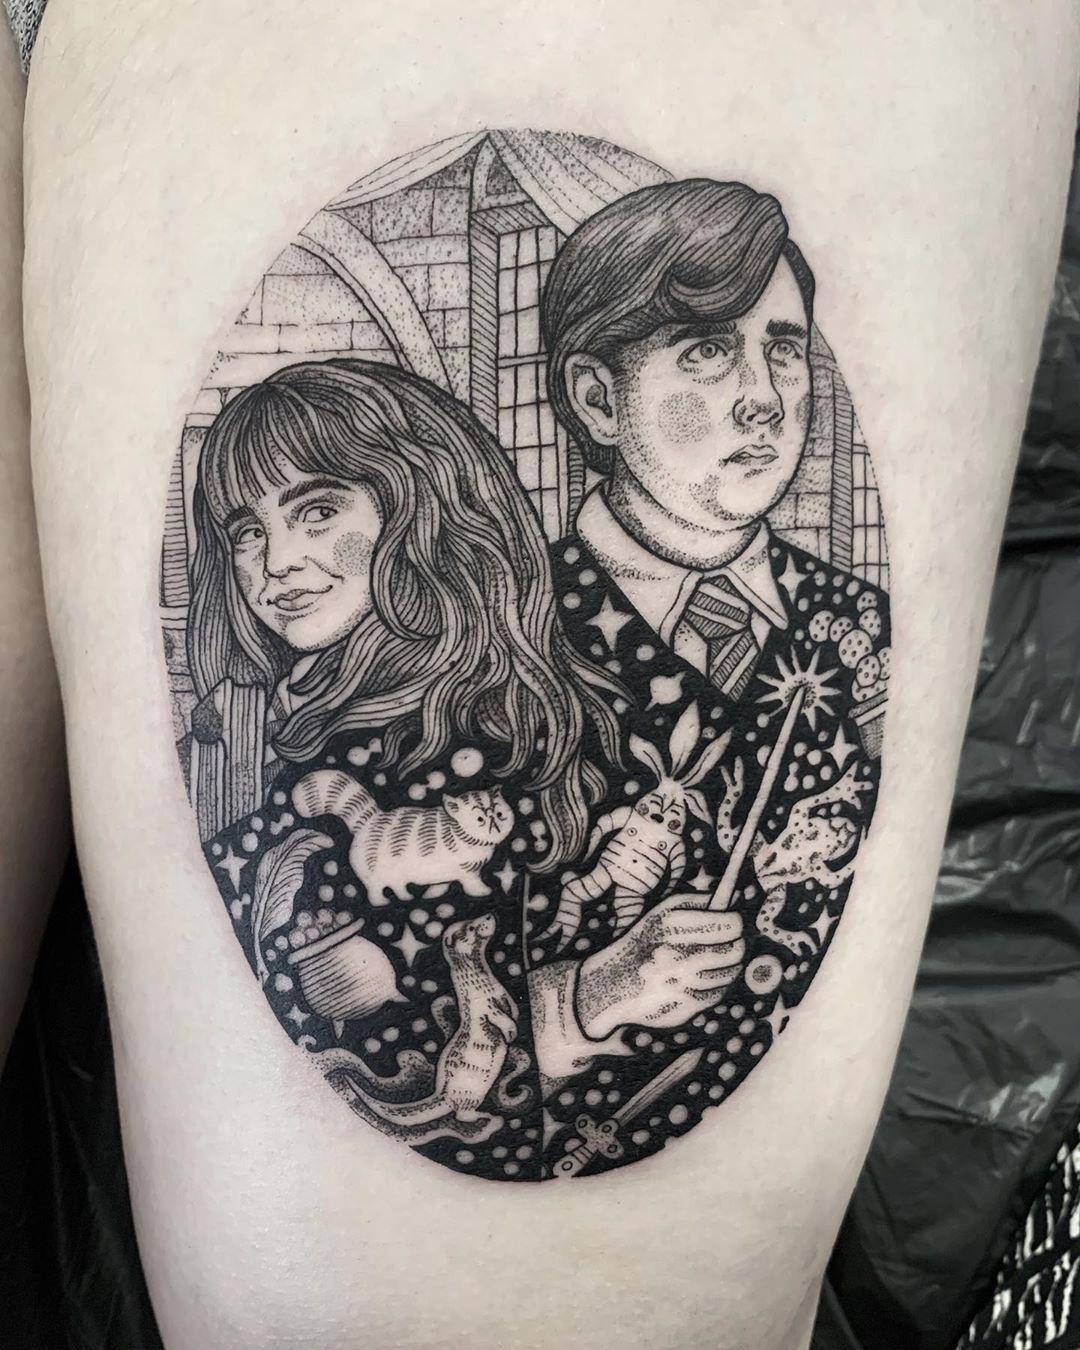 Harry Potter Tattoos Design Inspiration For Fans Hogwarts Tattoo Unique Tattoo Designs Fandom Tattoos